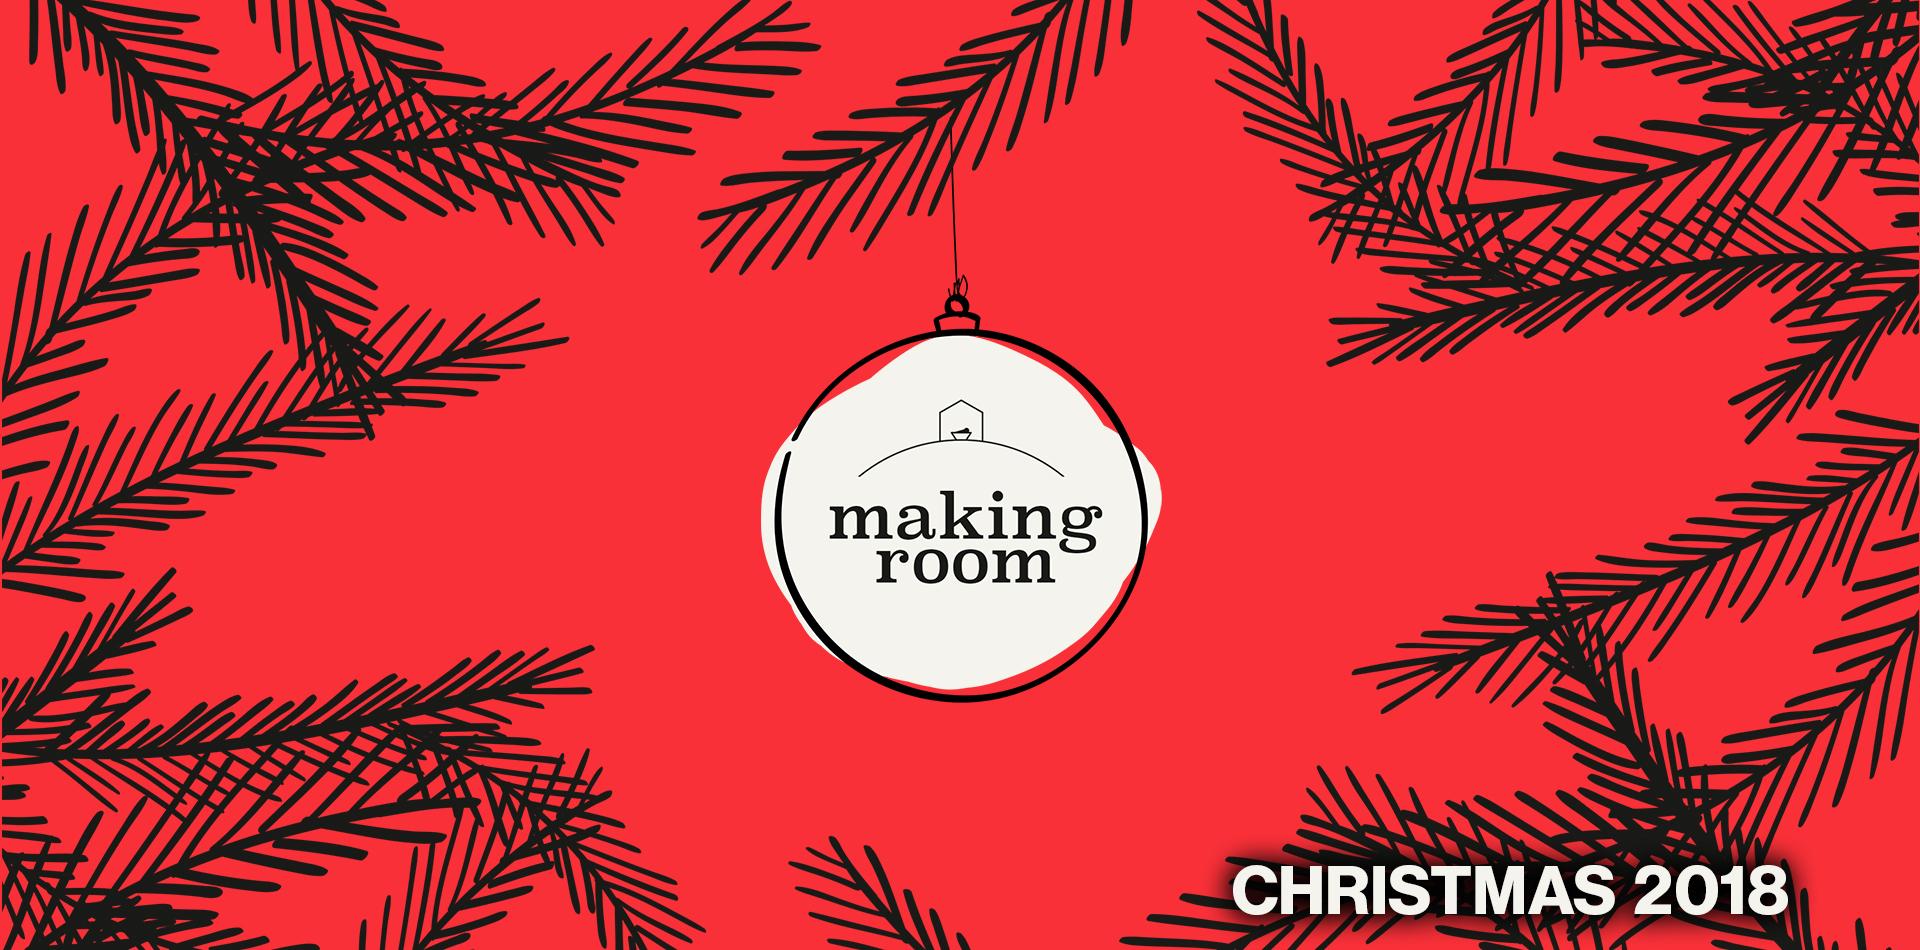 Christmas 2018 Thumb.jpg